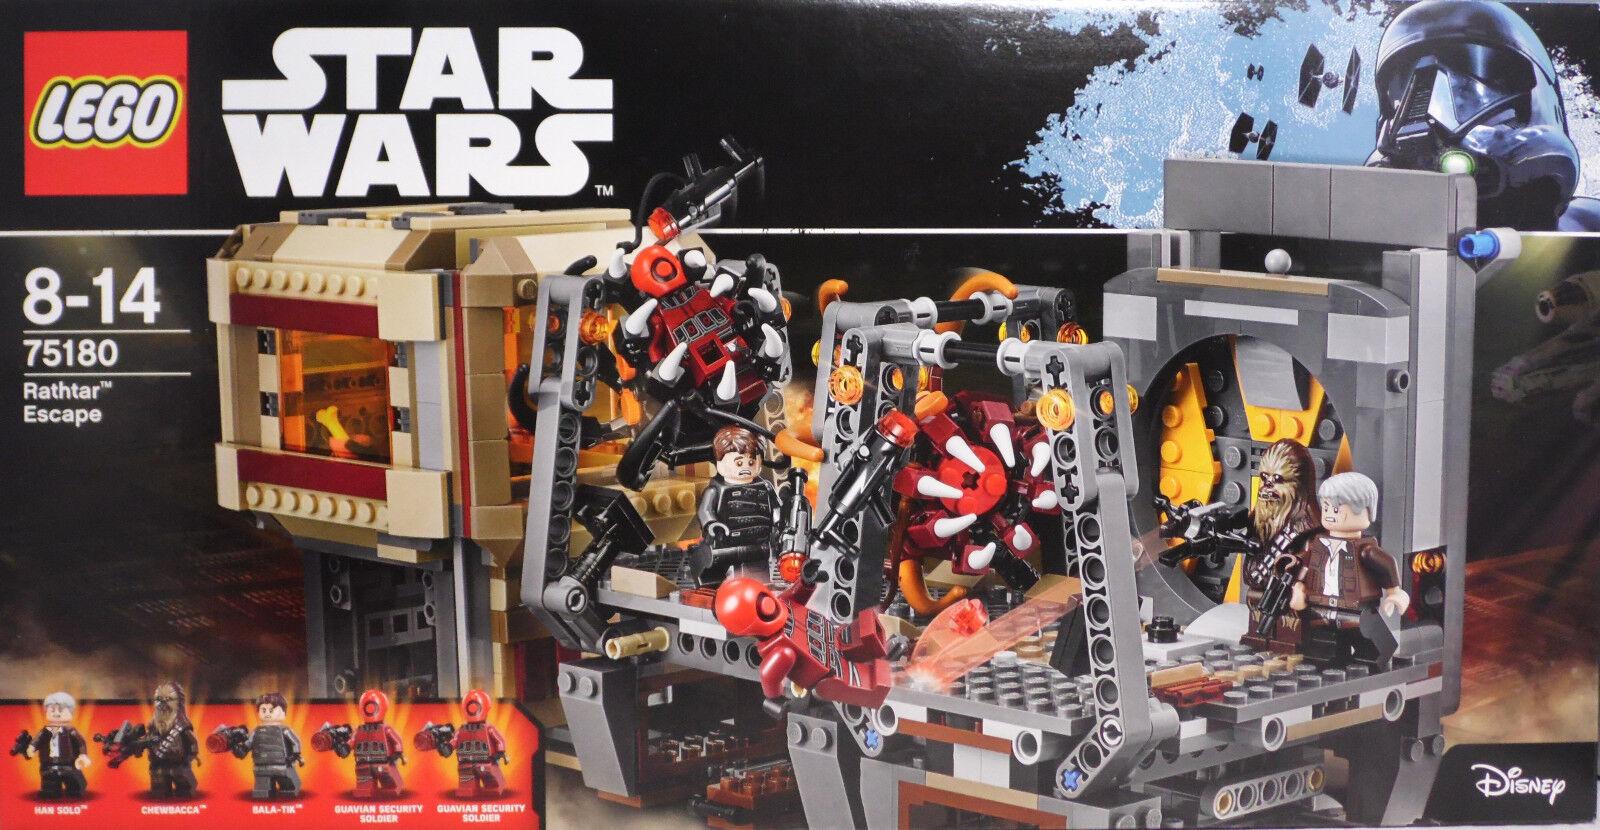 LEGO Star Wars 75180 Rathtar Escape Han Solo Chewbacca Bala-Tik Guavian NEU